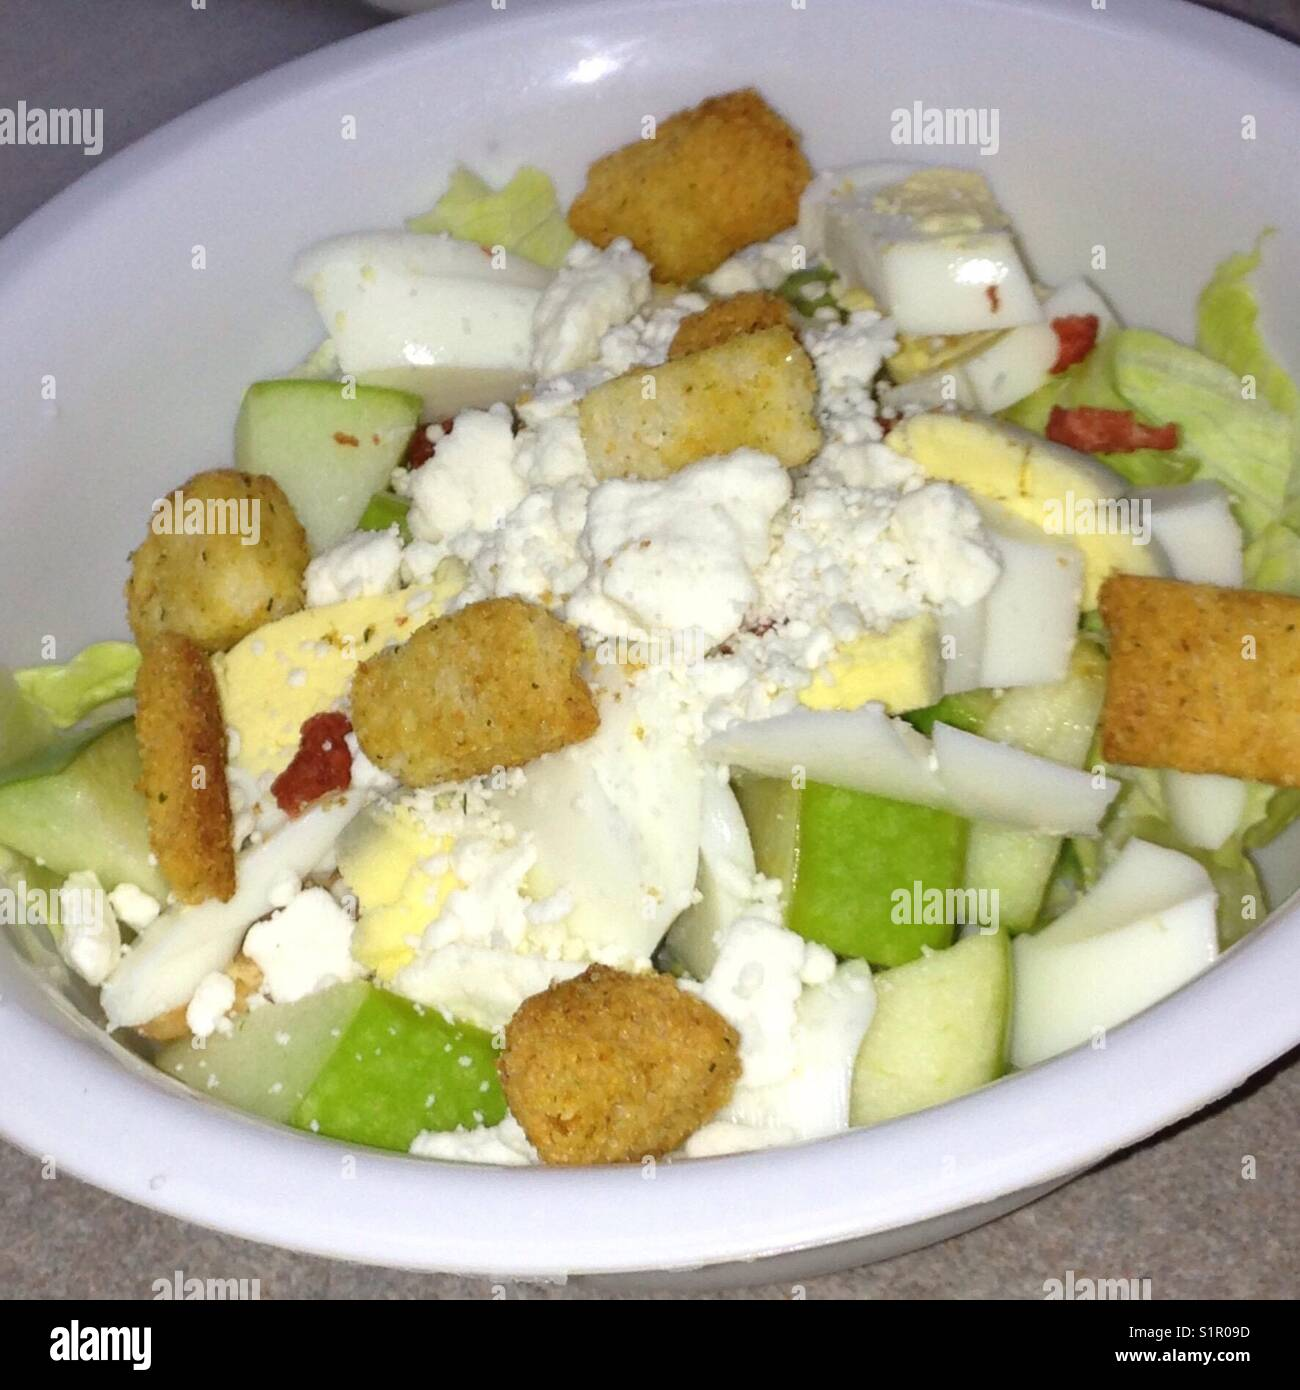 Single serving salad - Stock Image